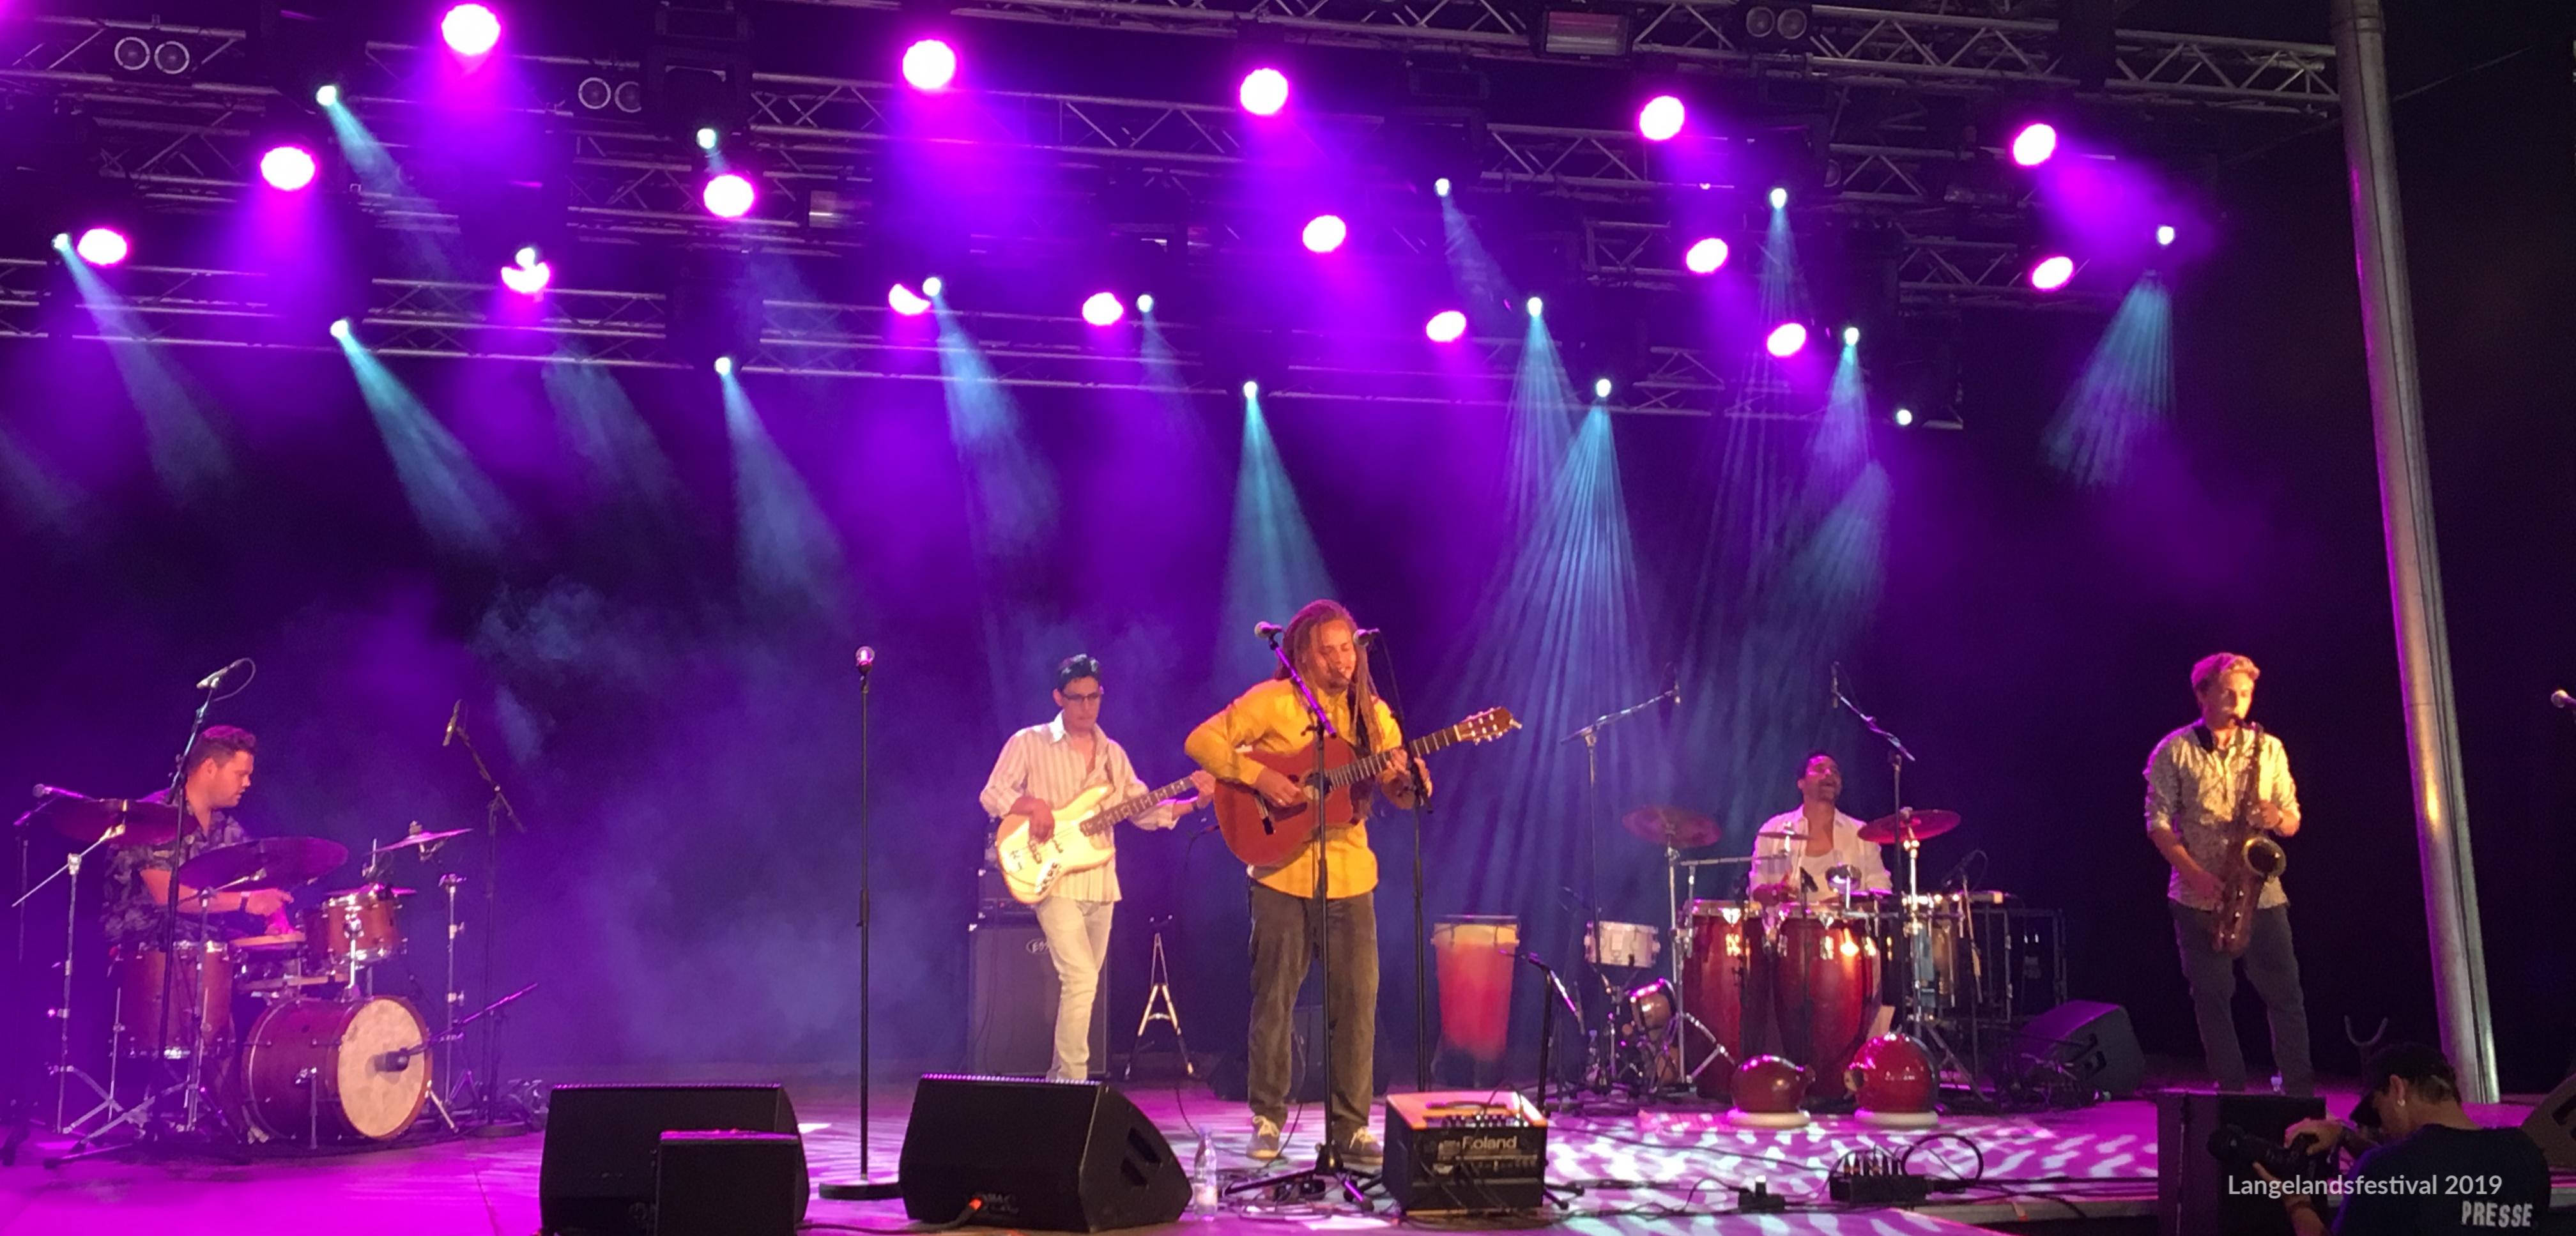 Langelandsfestival 2019